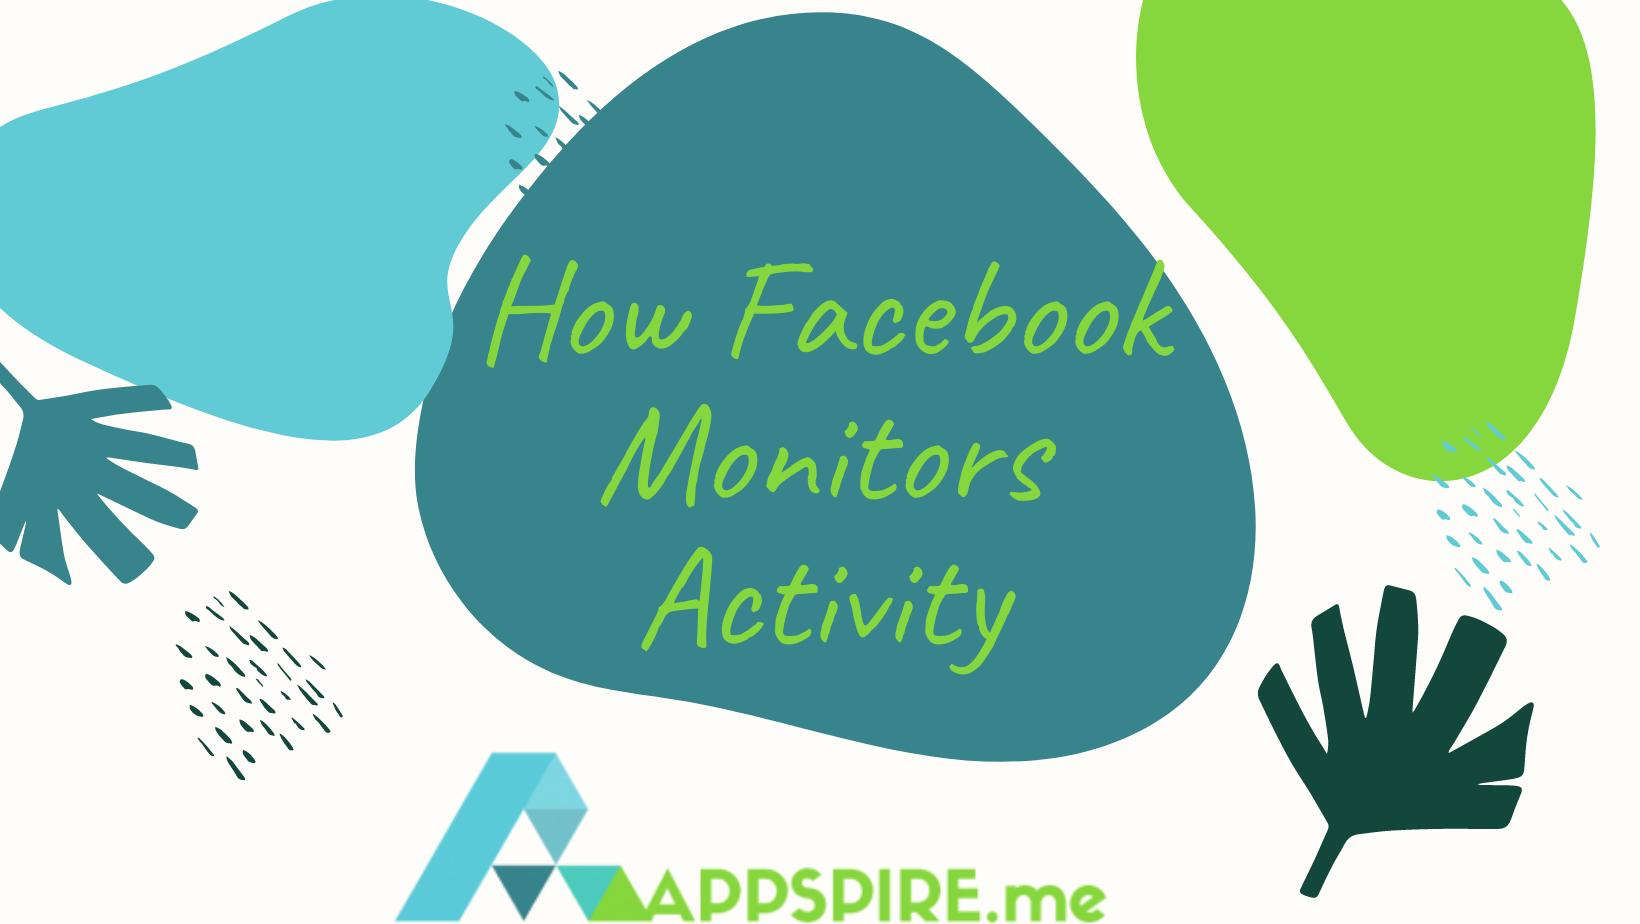 How Facebook Monitors Activity